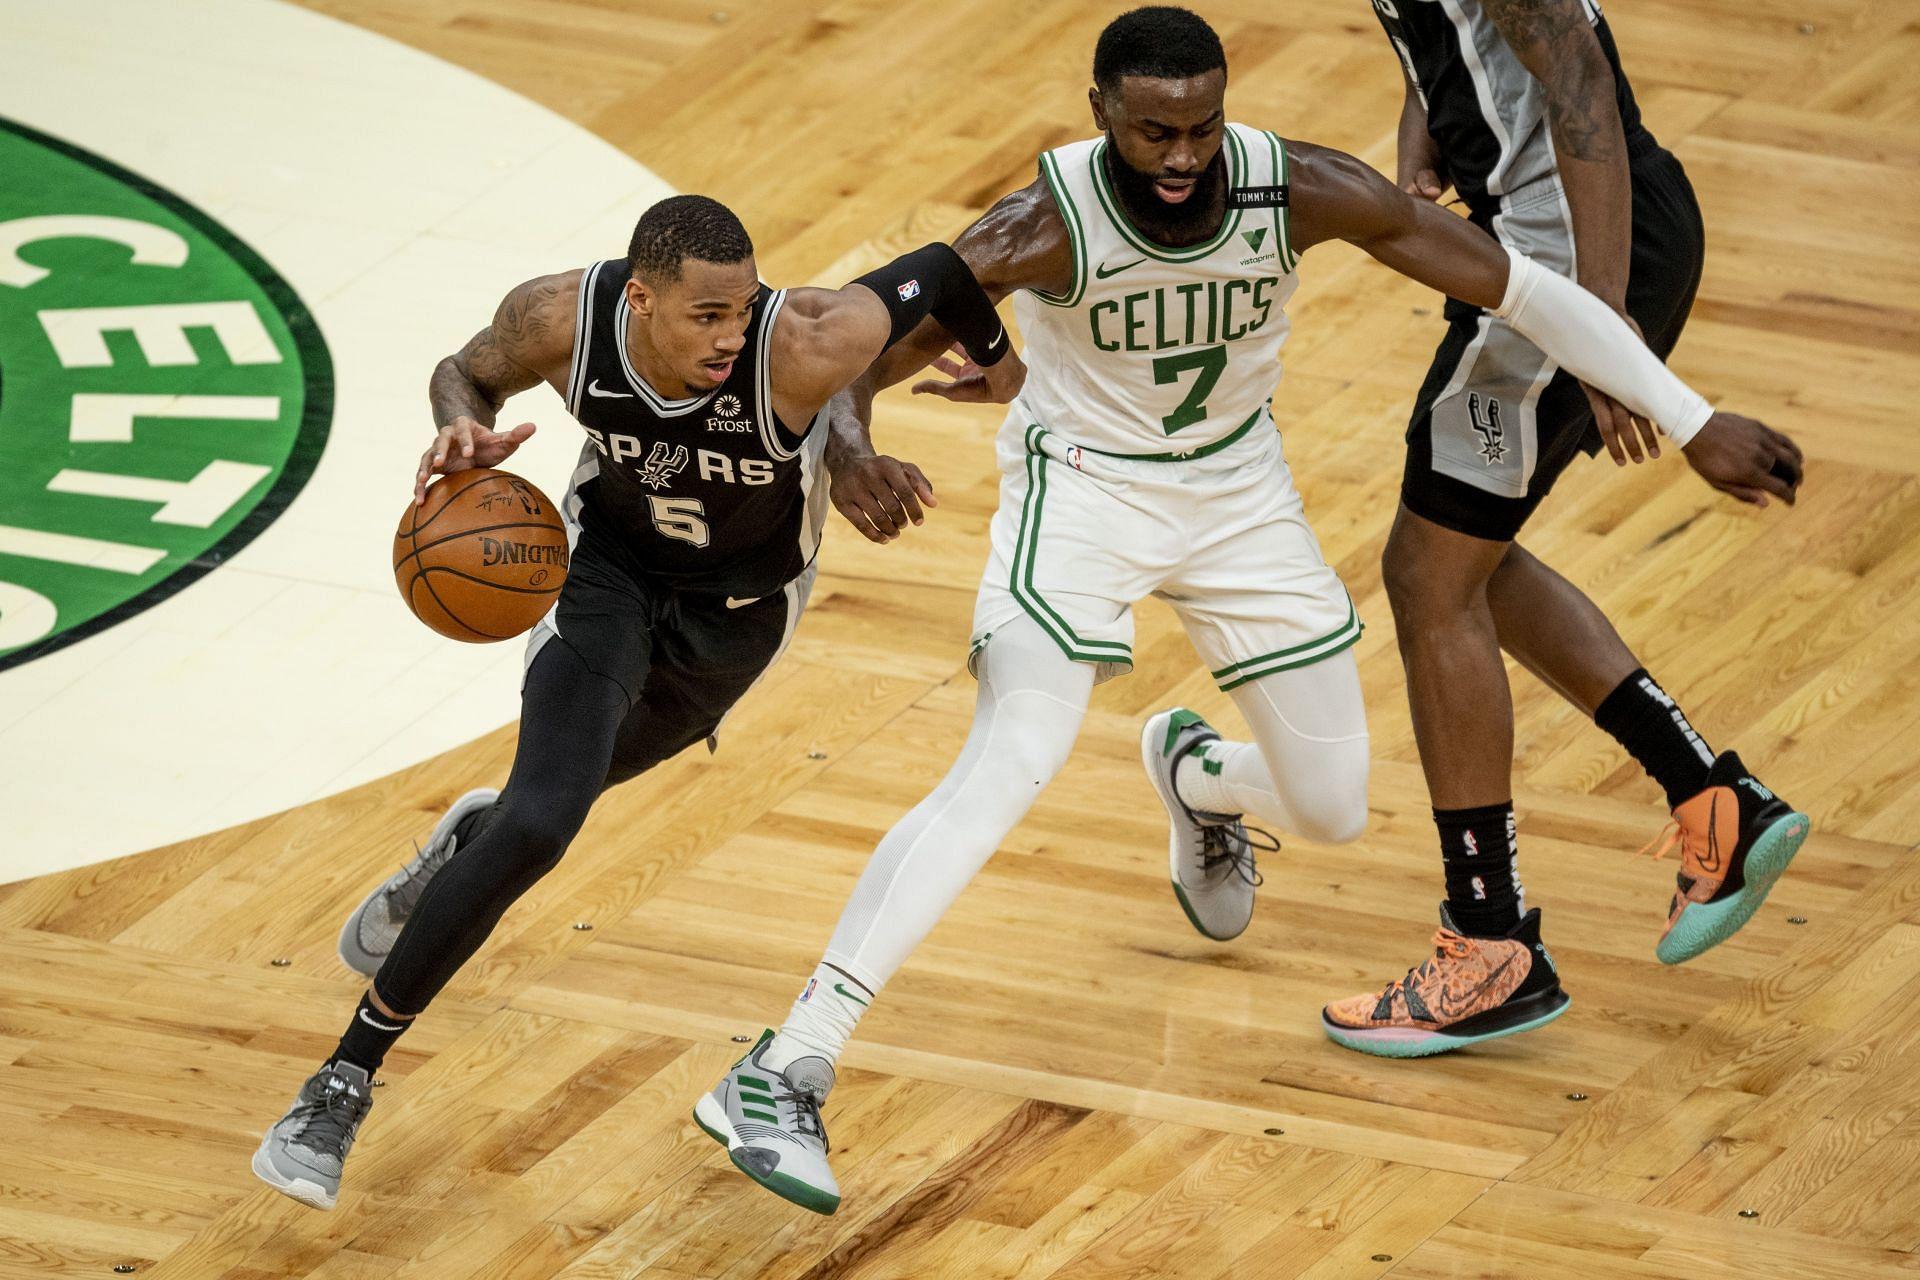 Dejounte Murray driving past Jaylen Brown of the Celtics